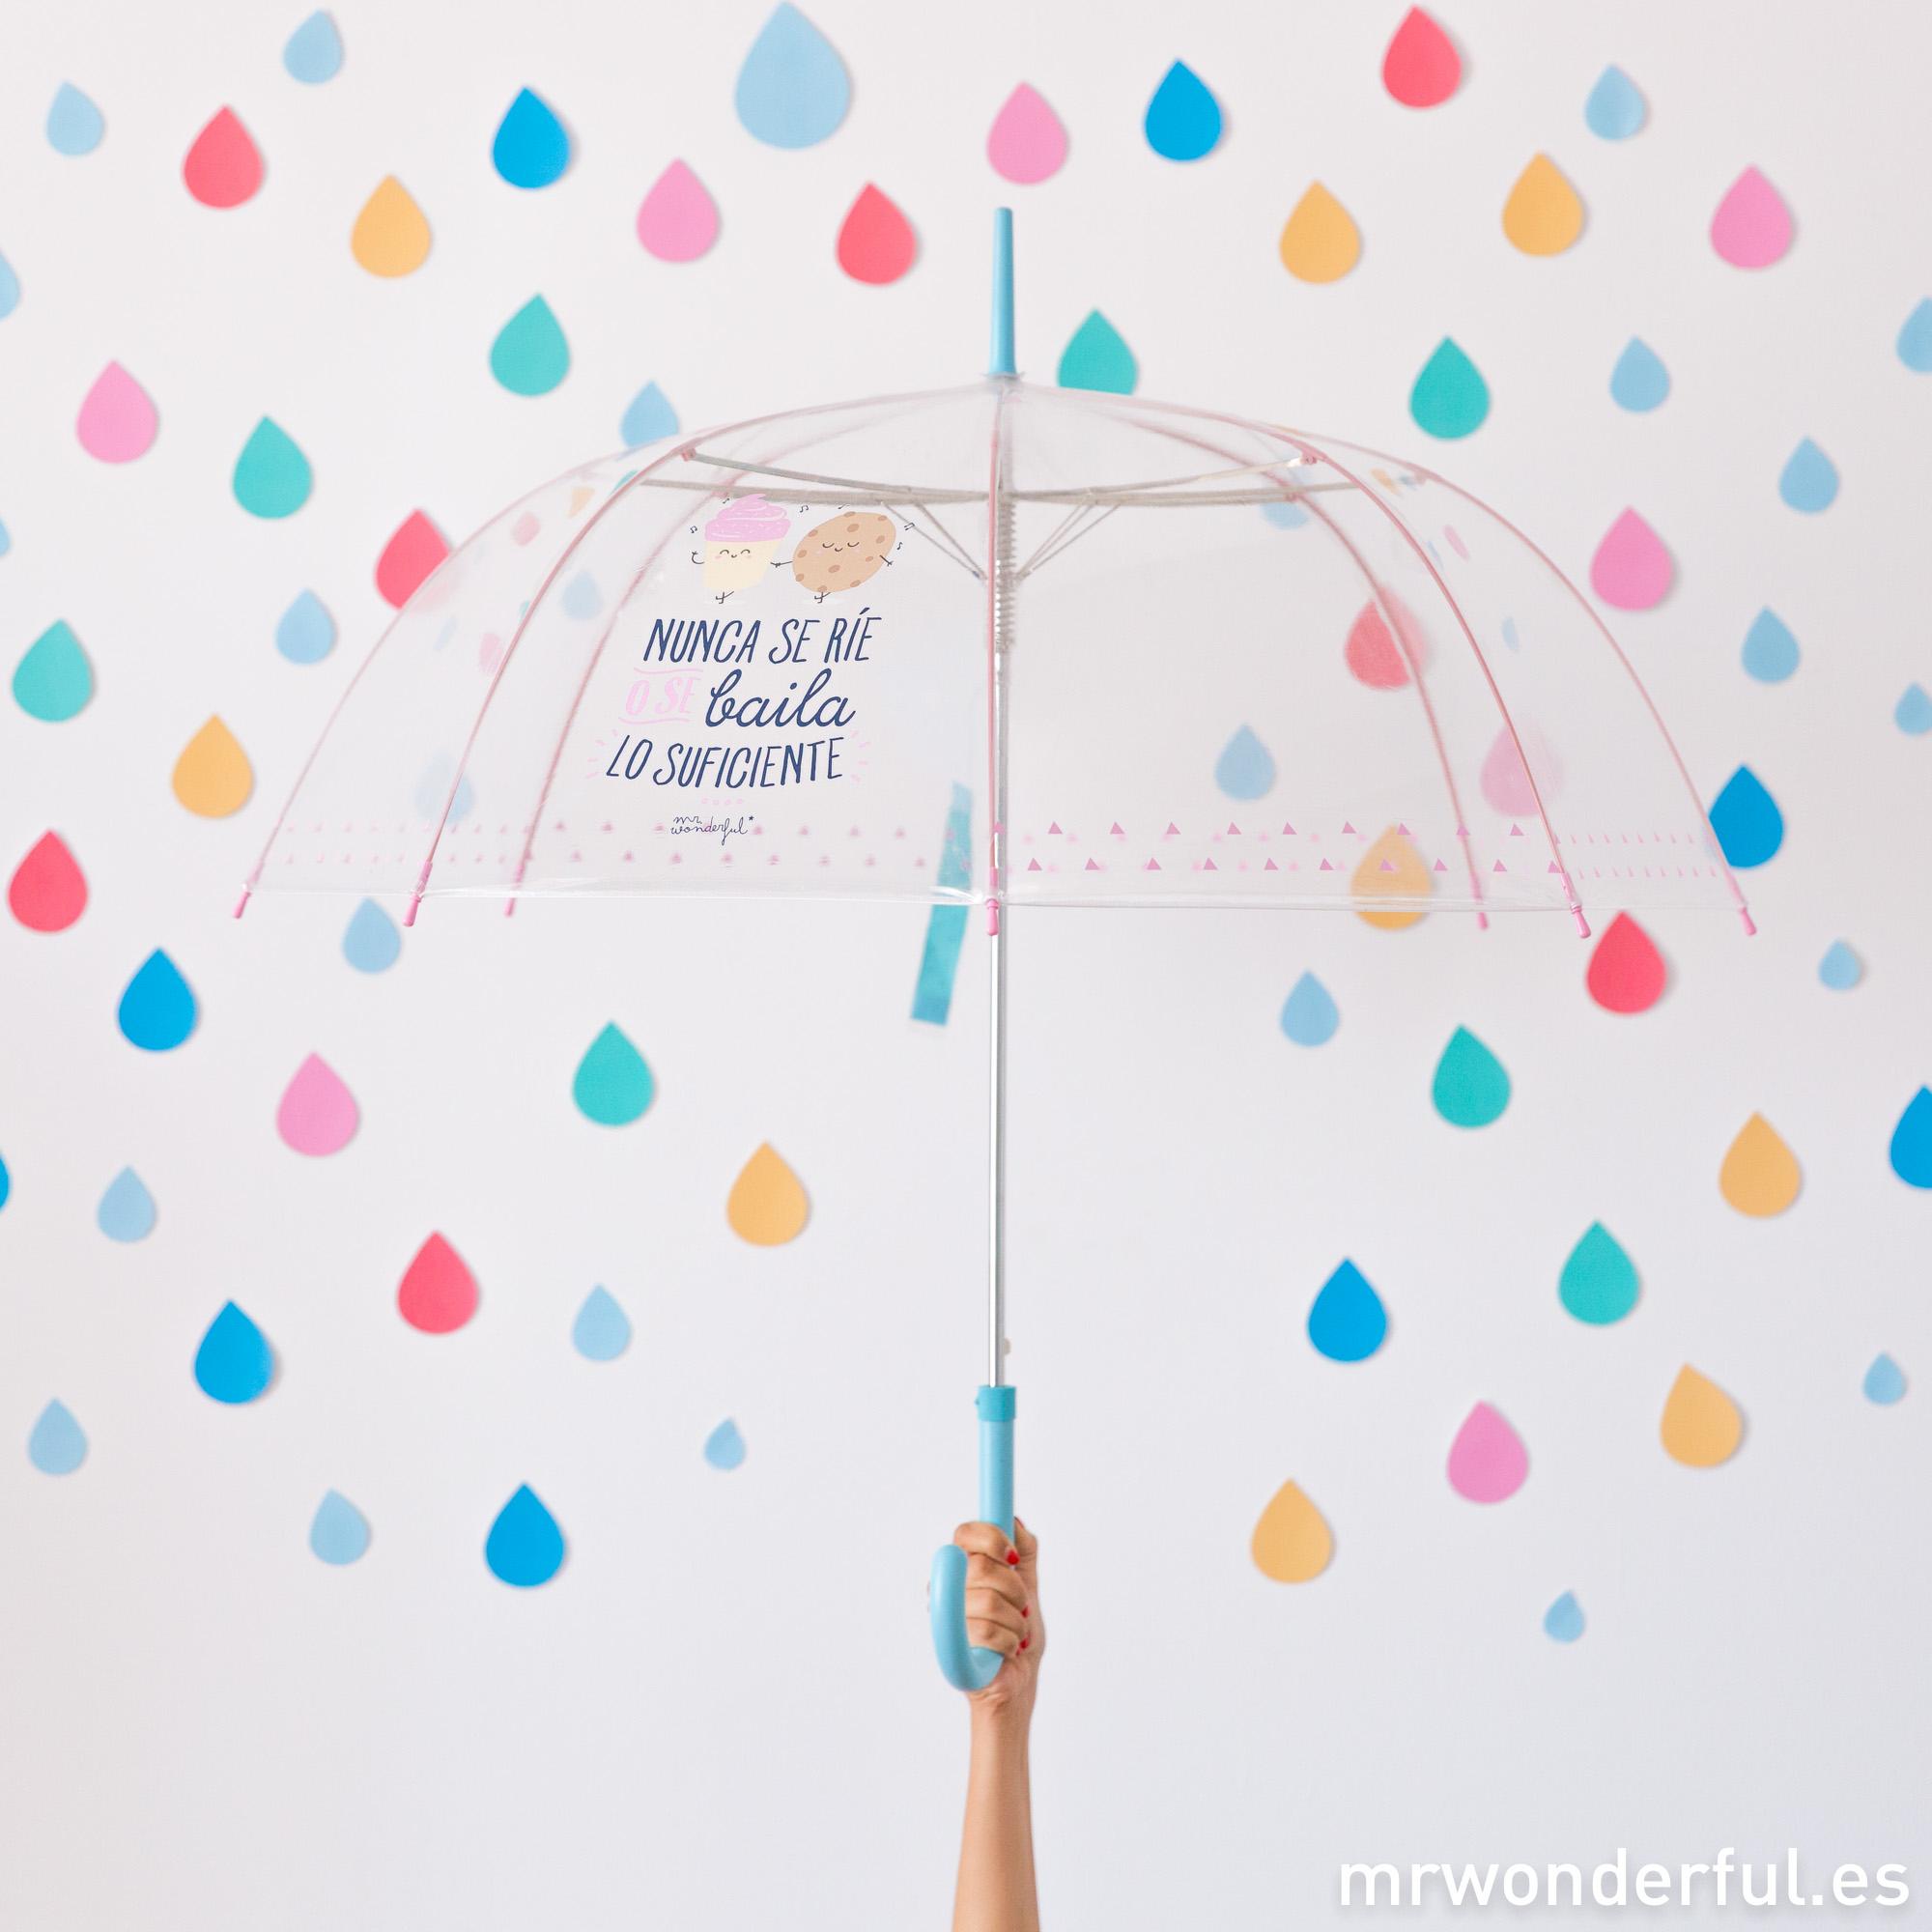 mrwonderful_8435460706827_paraguas_nunca-se-rie-o-se-baila-lo-suficiente-ES-2